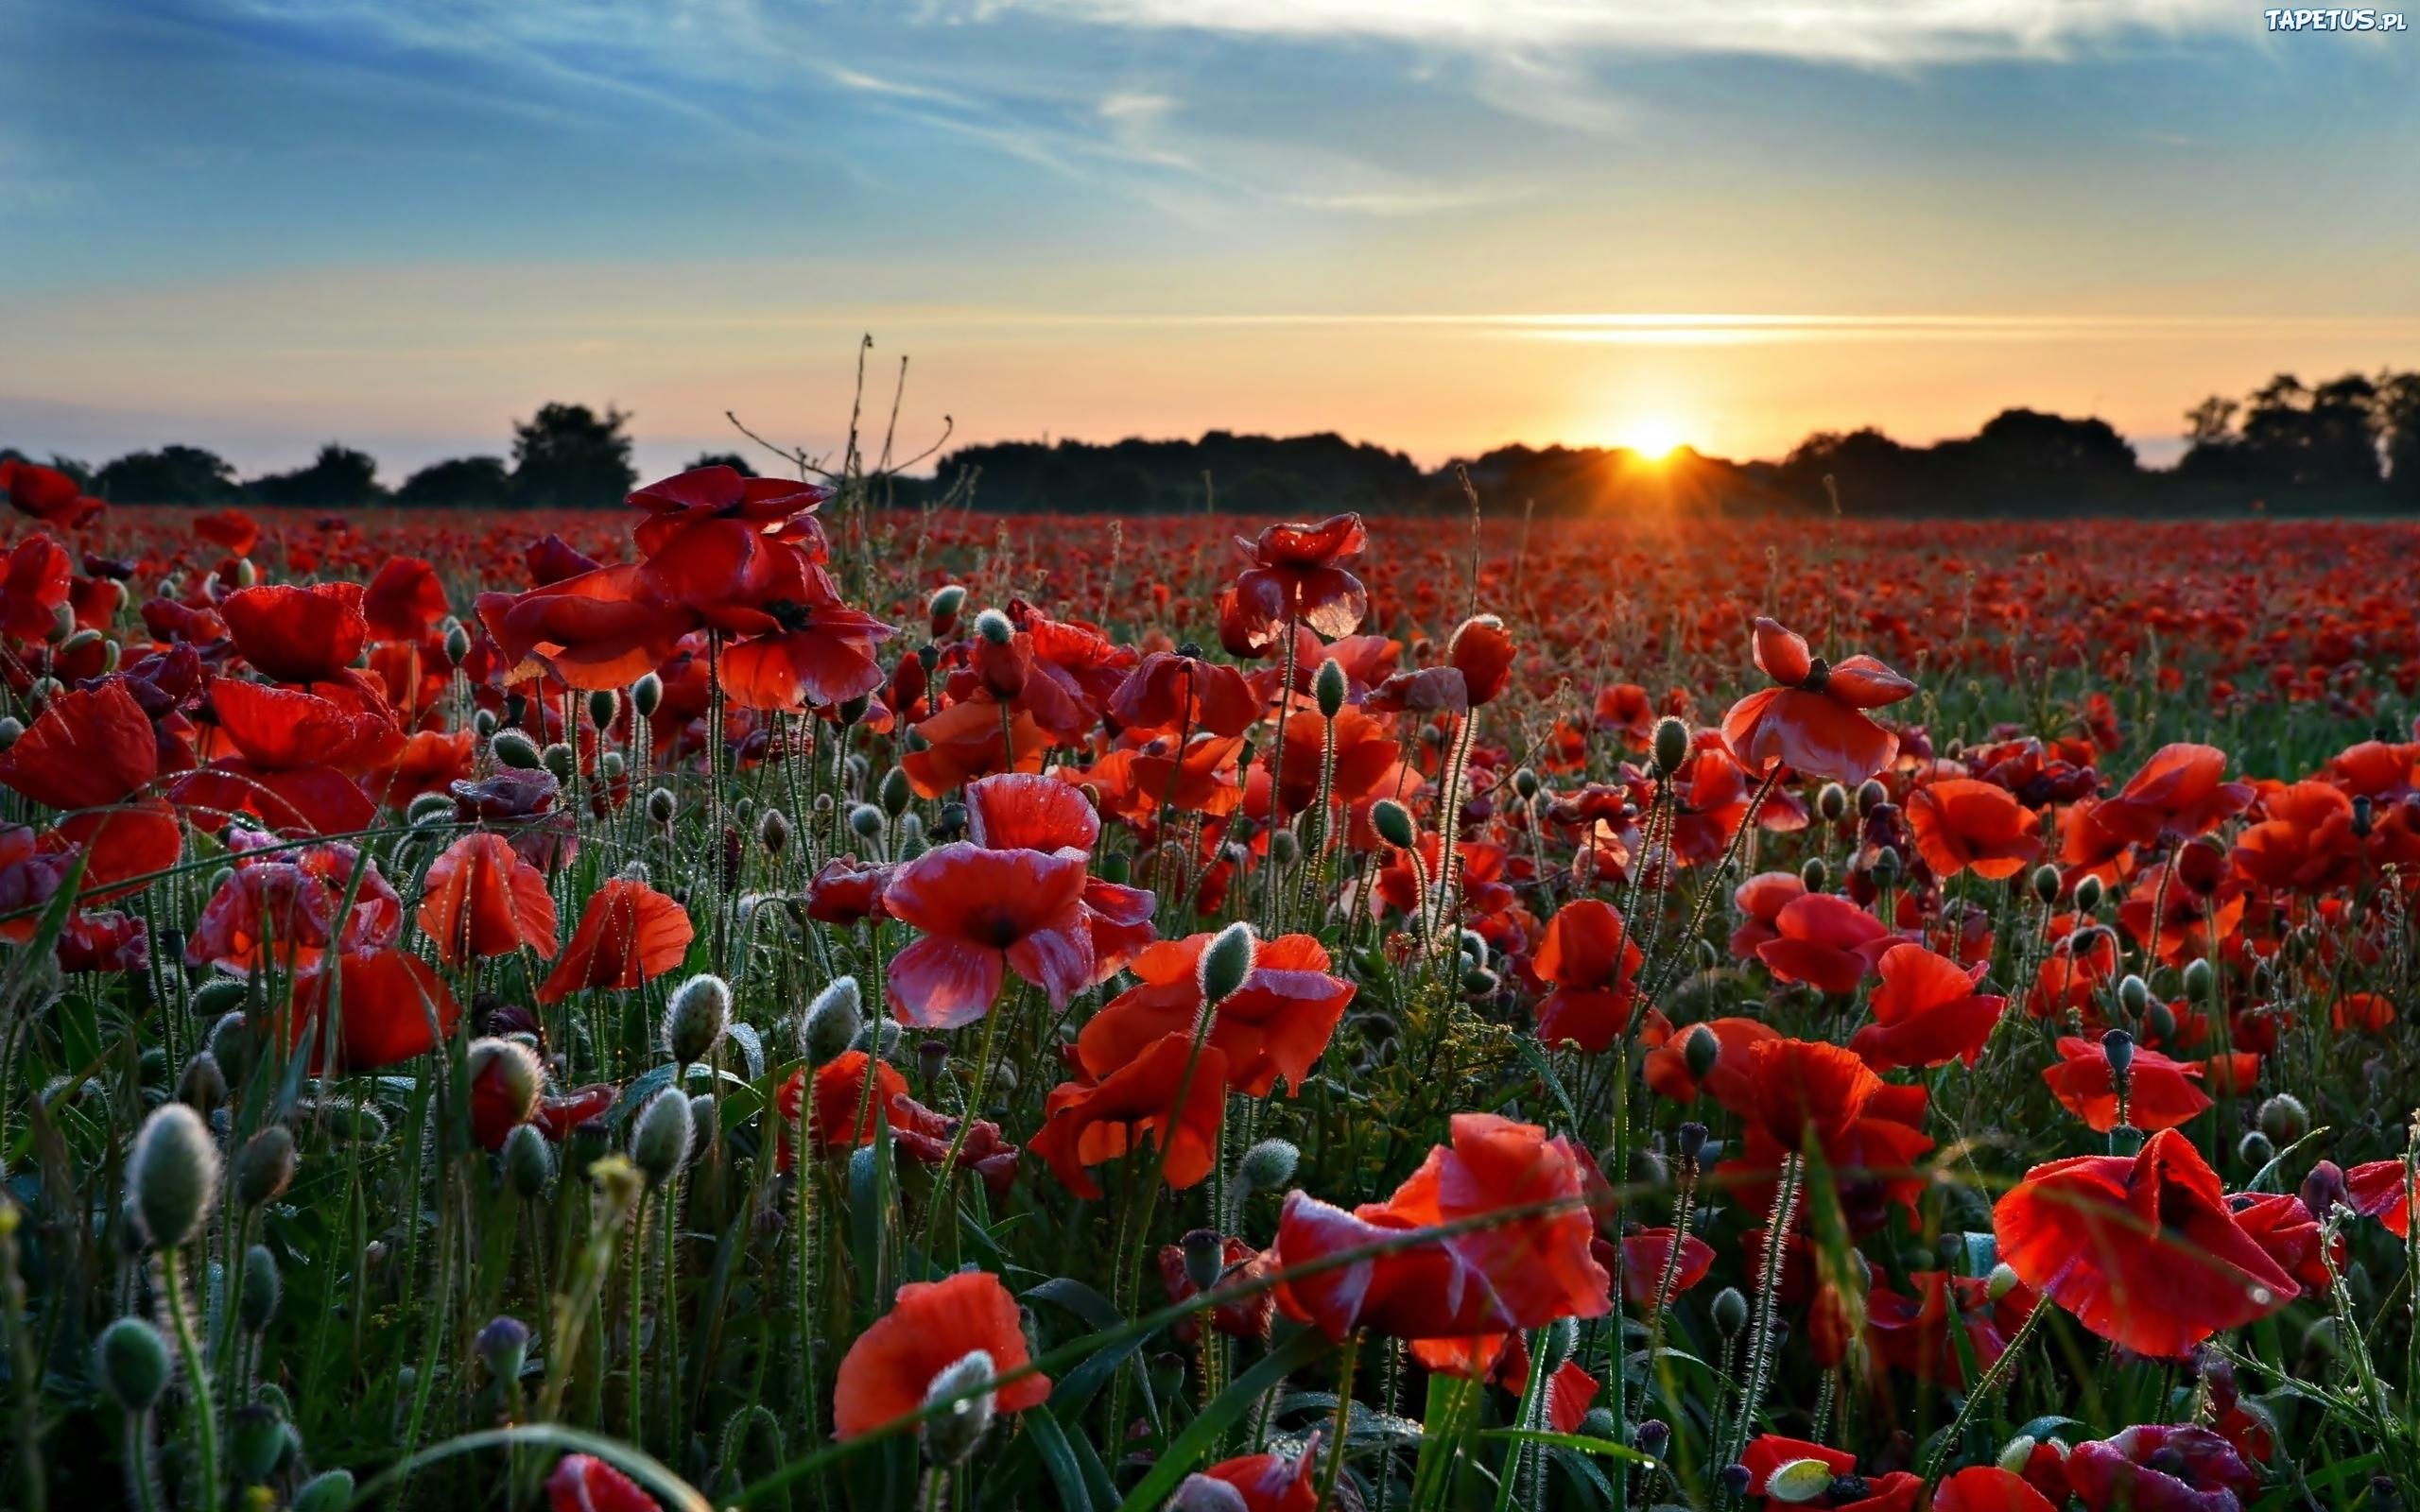 закат небо поляна цветы  № 3229917 бесплатно